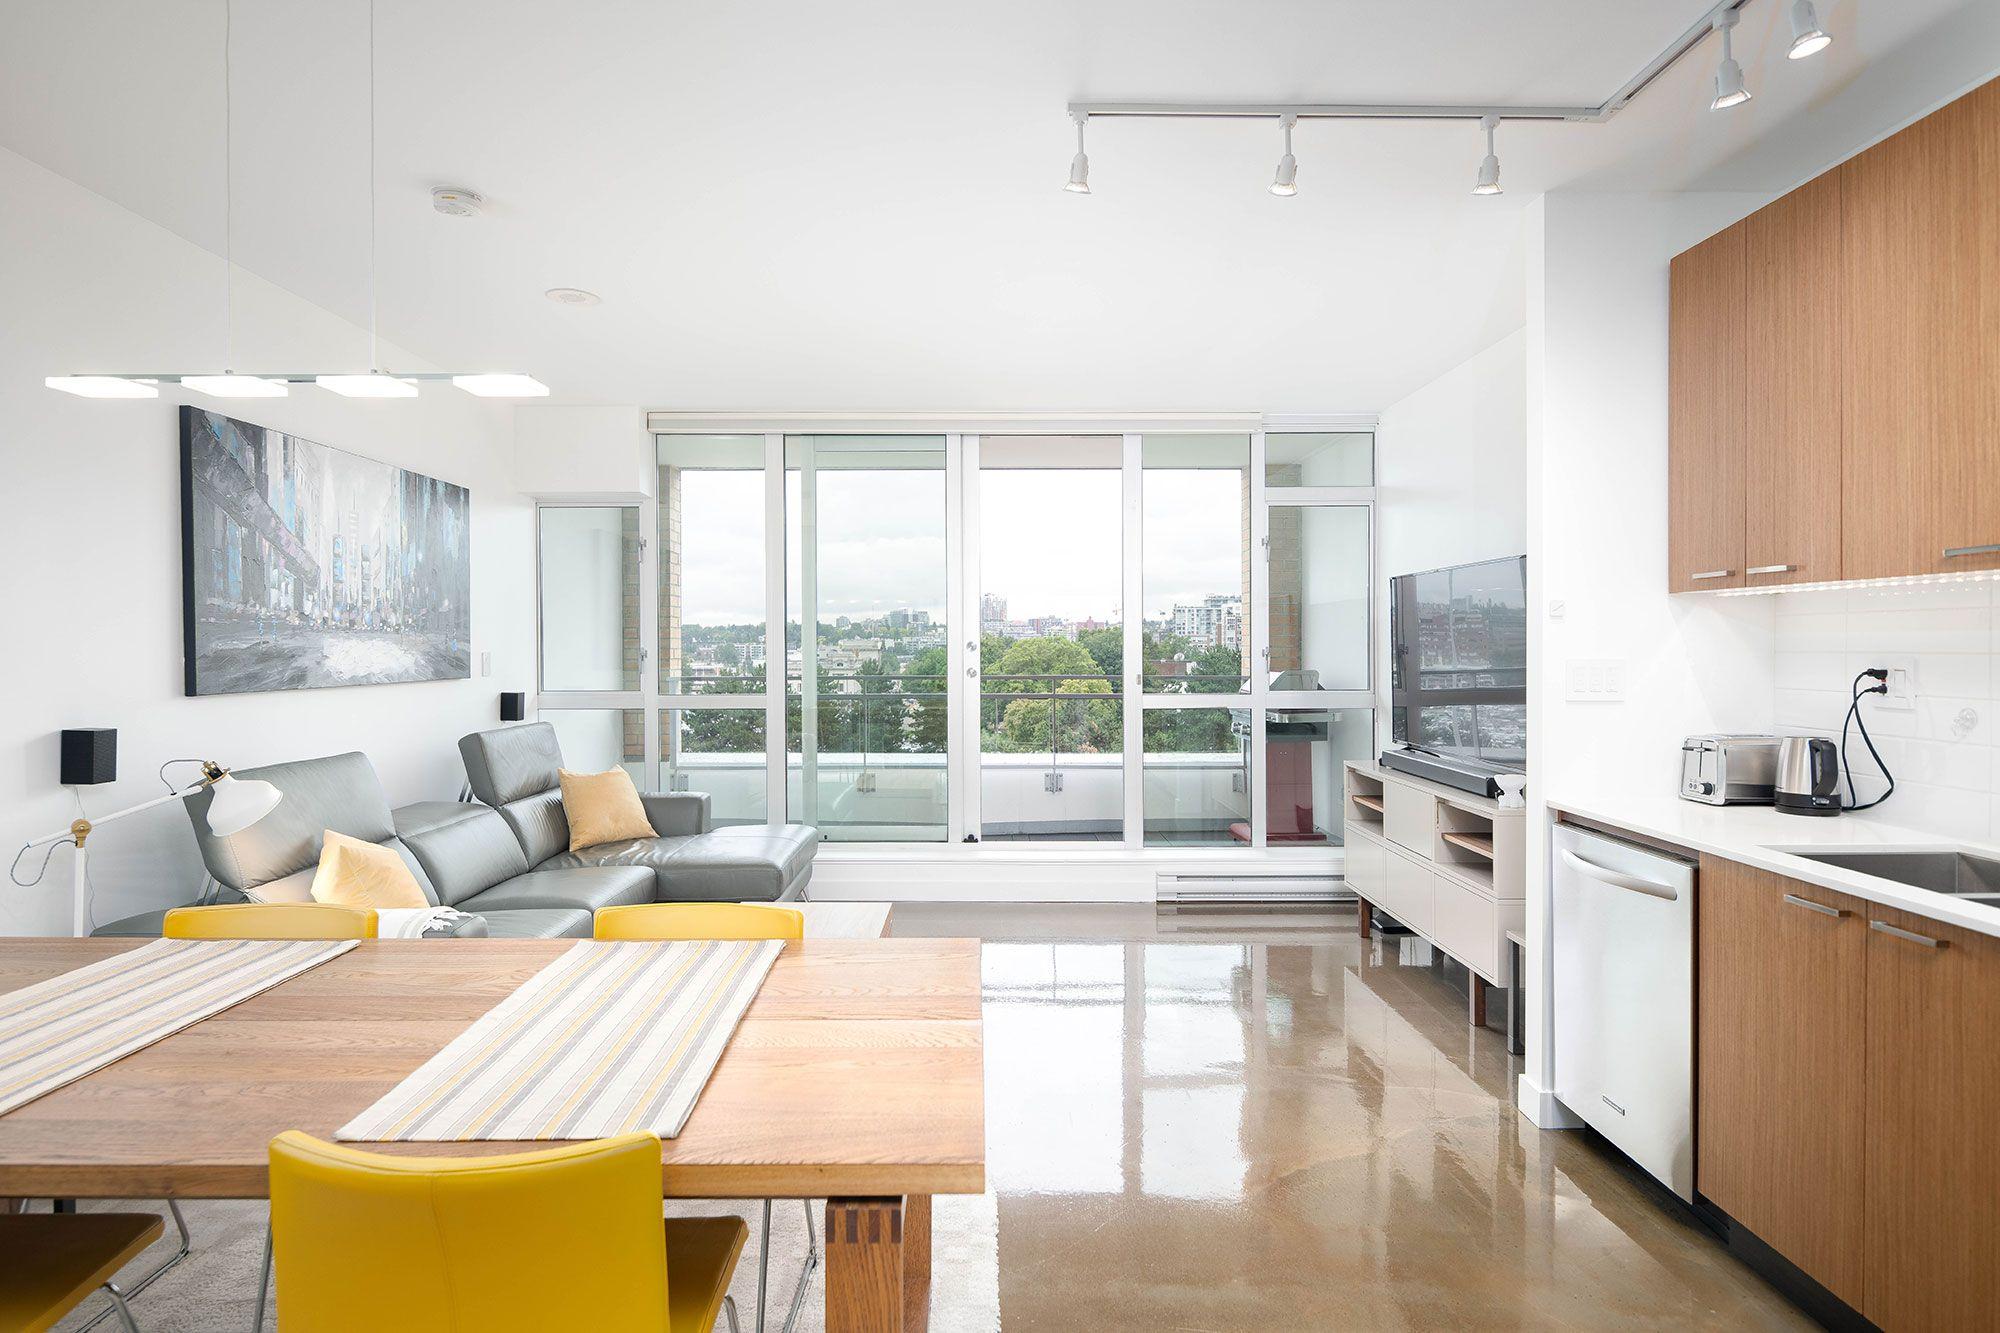 Strathcona - False Creek - Chinatown Apartment for sale: V6A 1 bedroom Stunning Designer Suite 631 sq.ft. (Listed 2019-07-15)